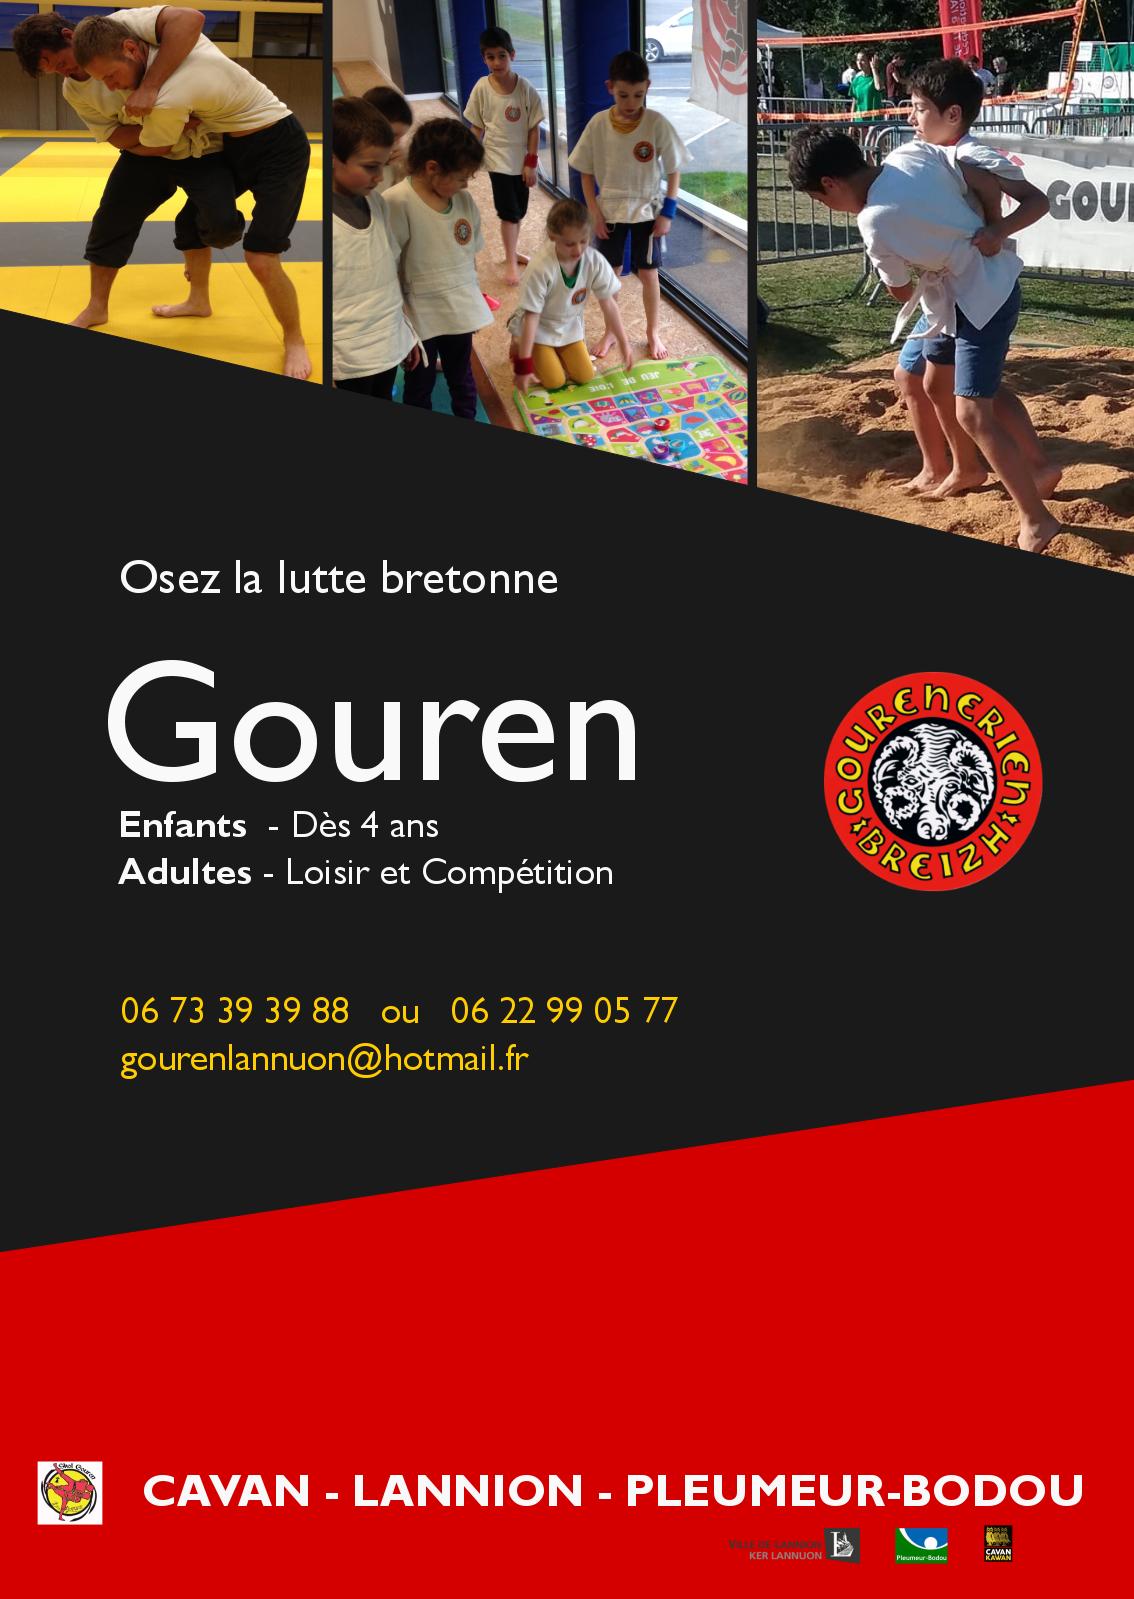 Skol Gouren